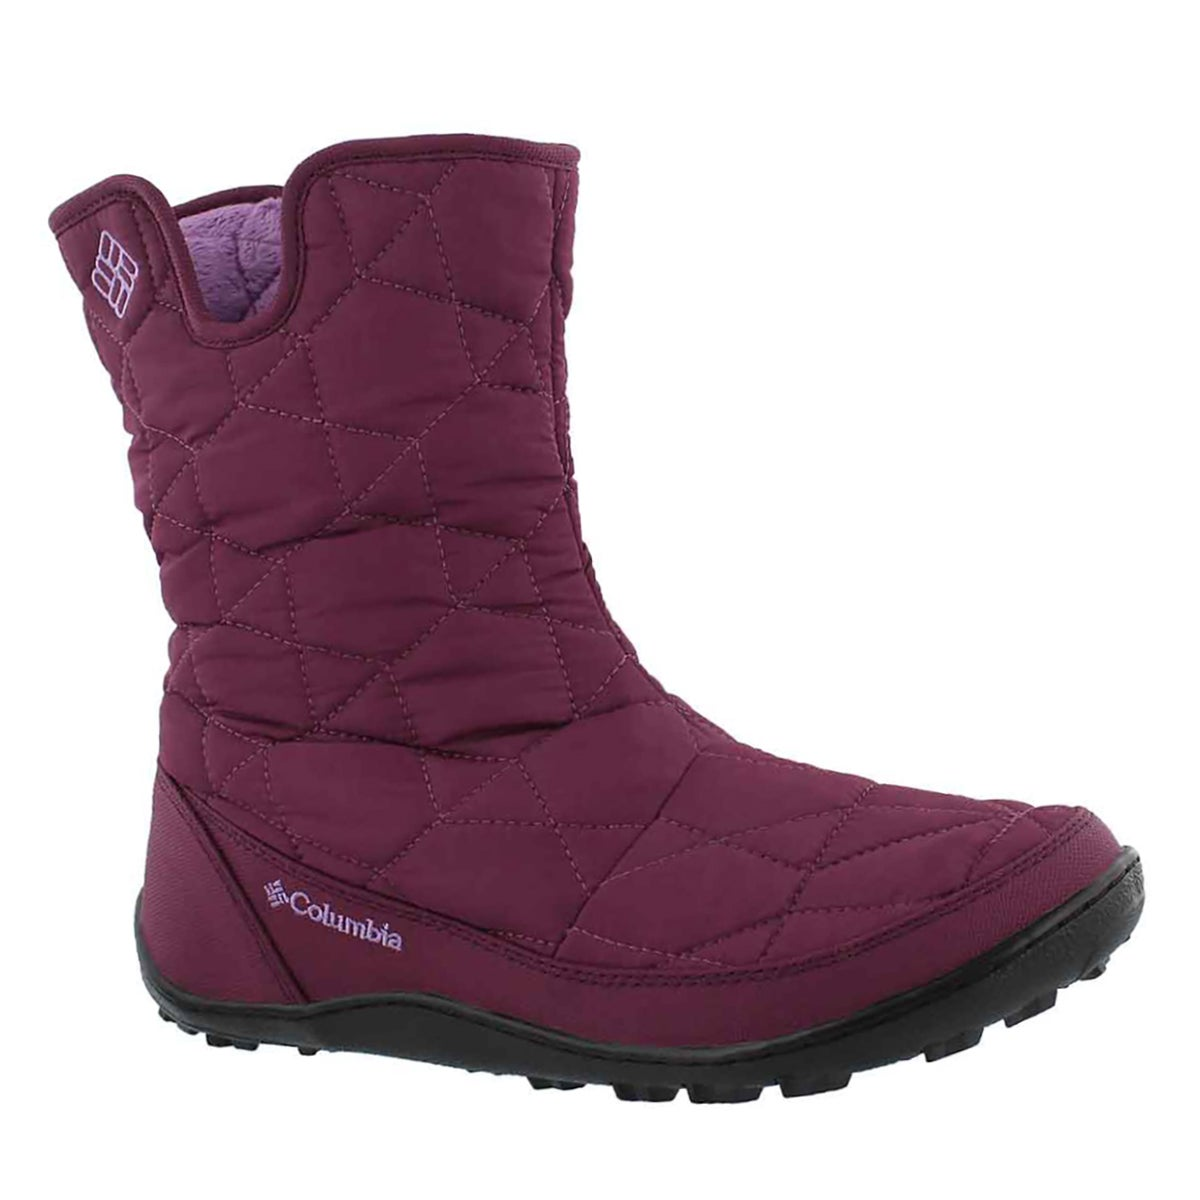 Women's MINX SLIP II raspberry pullon winter boots